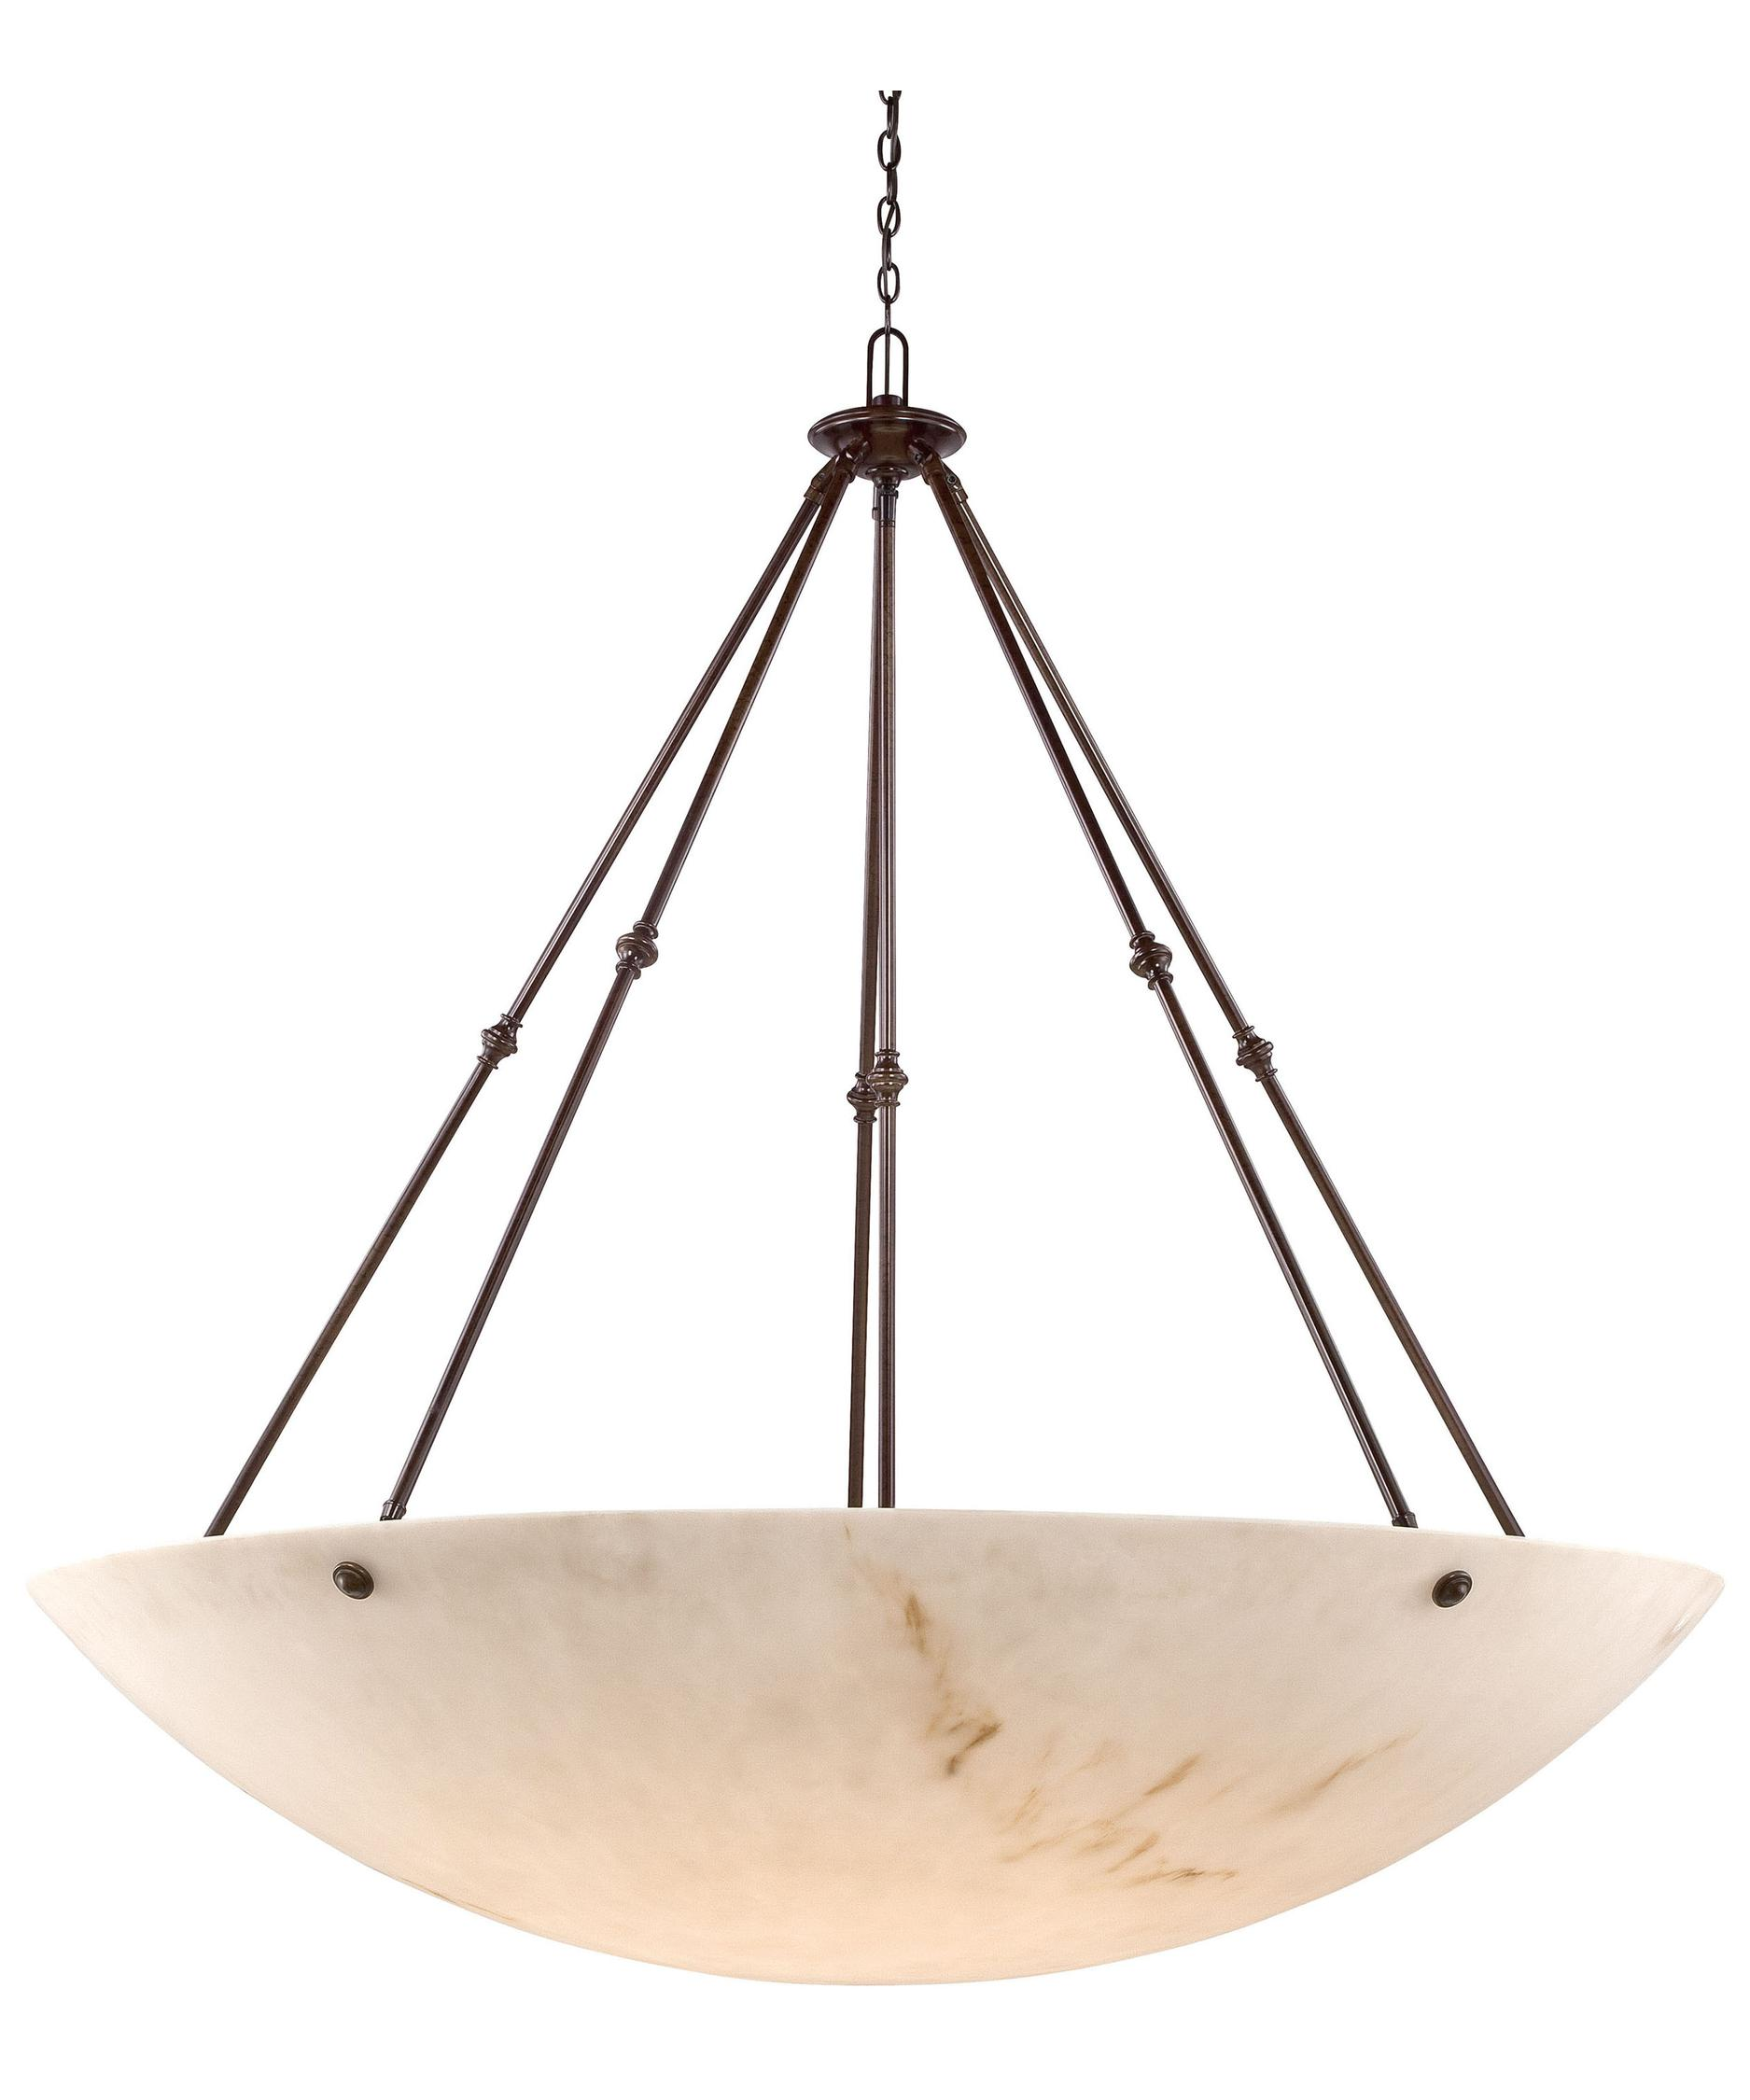 Metropolitan Virtuoso II 59 Inch Wide 1 Light Large Pendant – Alabaster Lighting Chandeliers